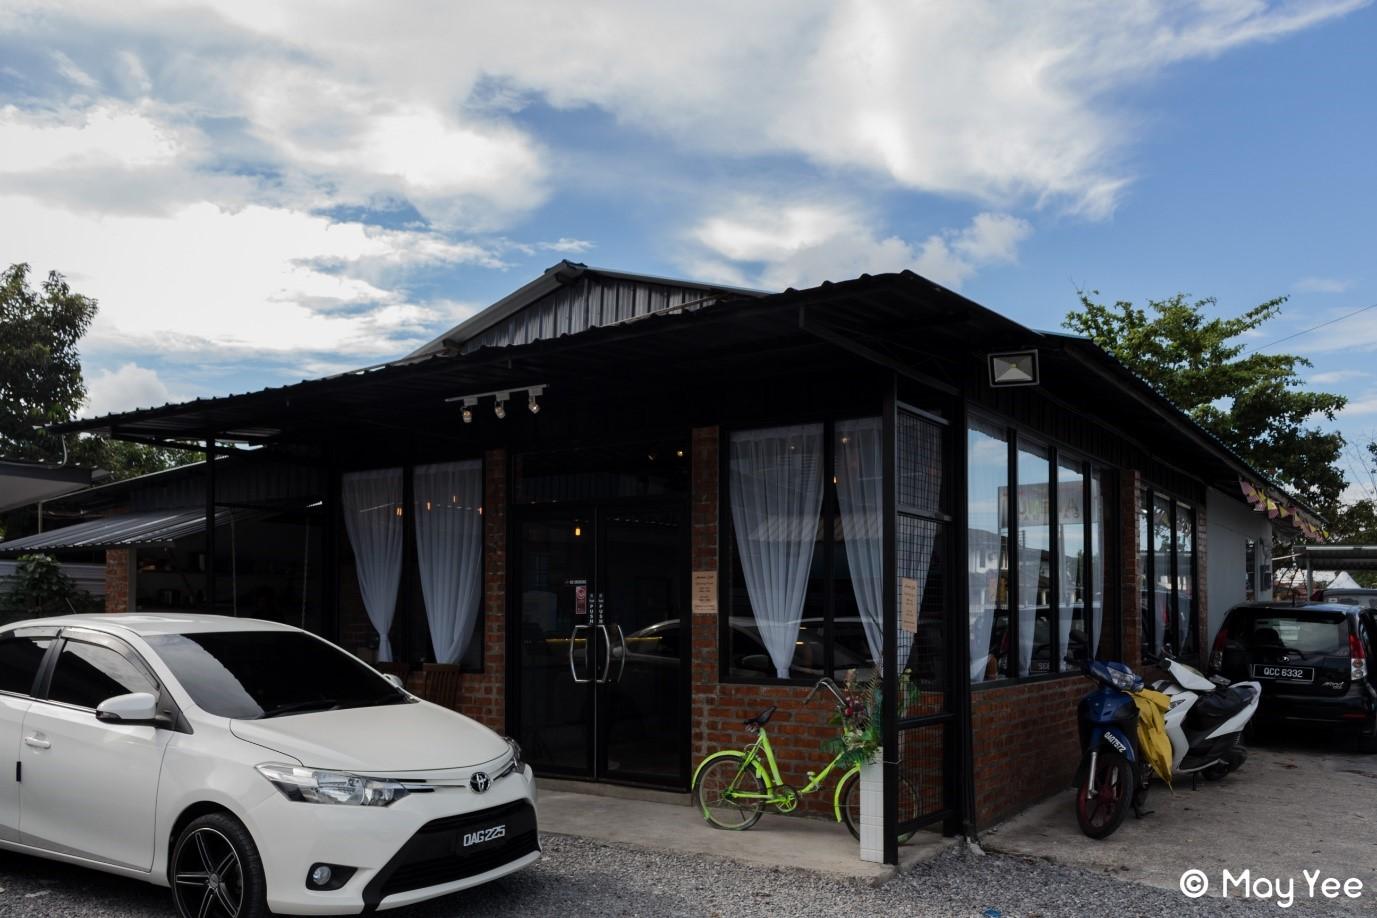 Image source:   https://www.getteaspoon.com/en/restaurant/avenuecafeworkshop-kuching